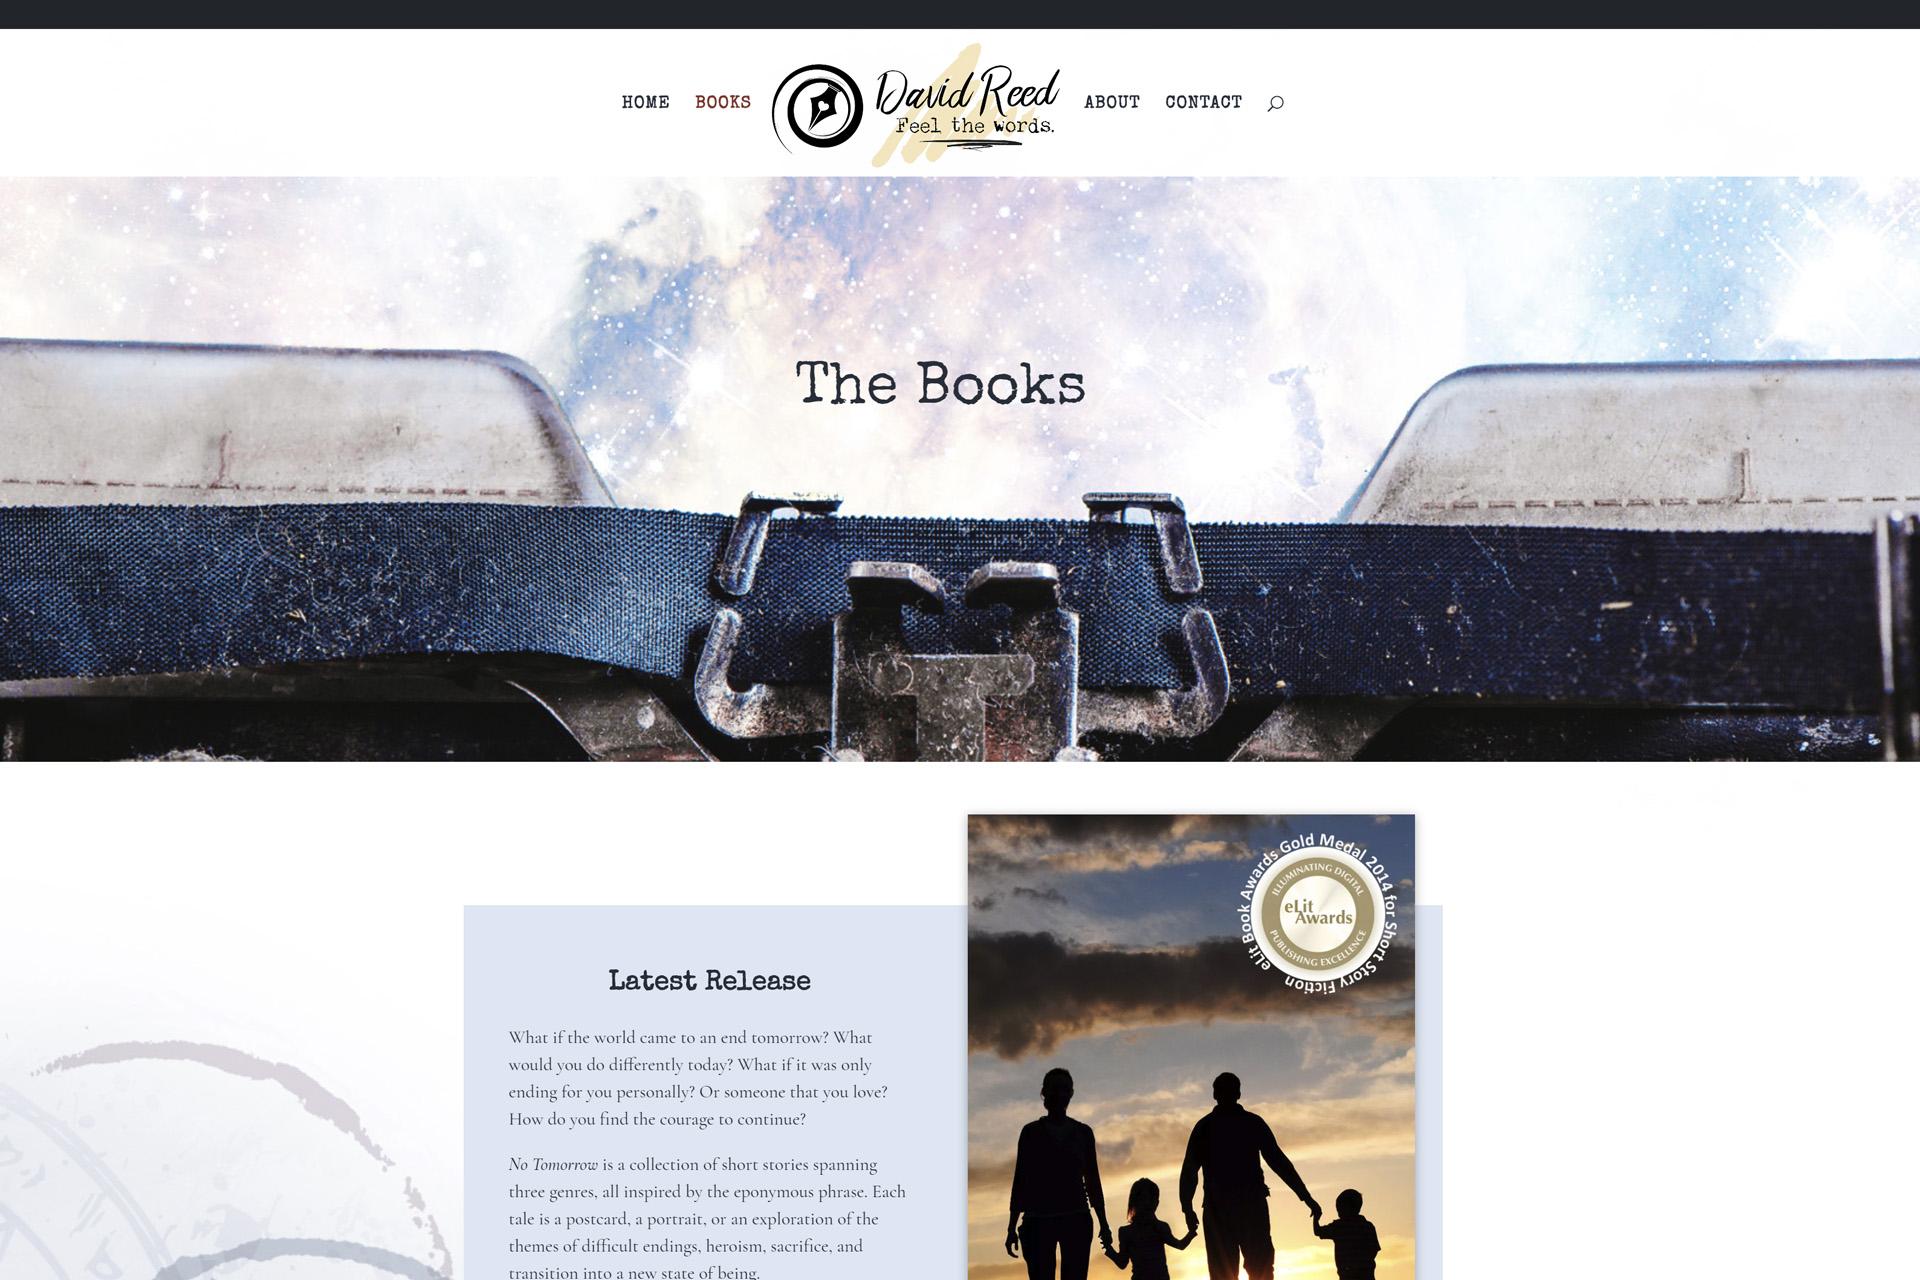 David Reed's Books